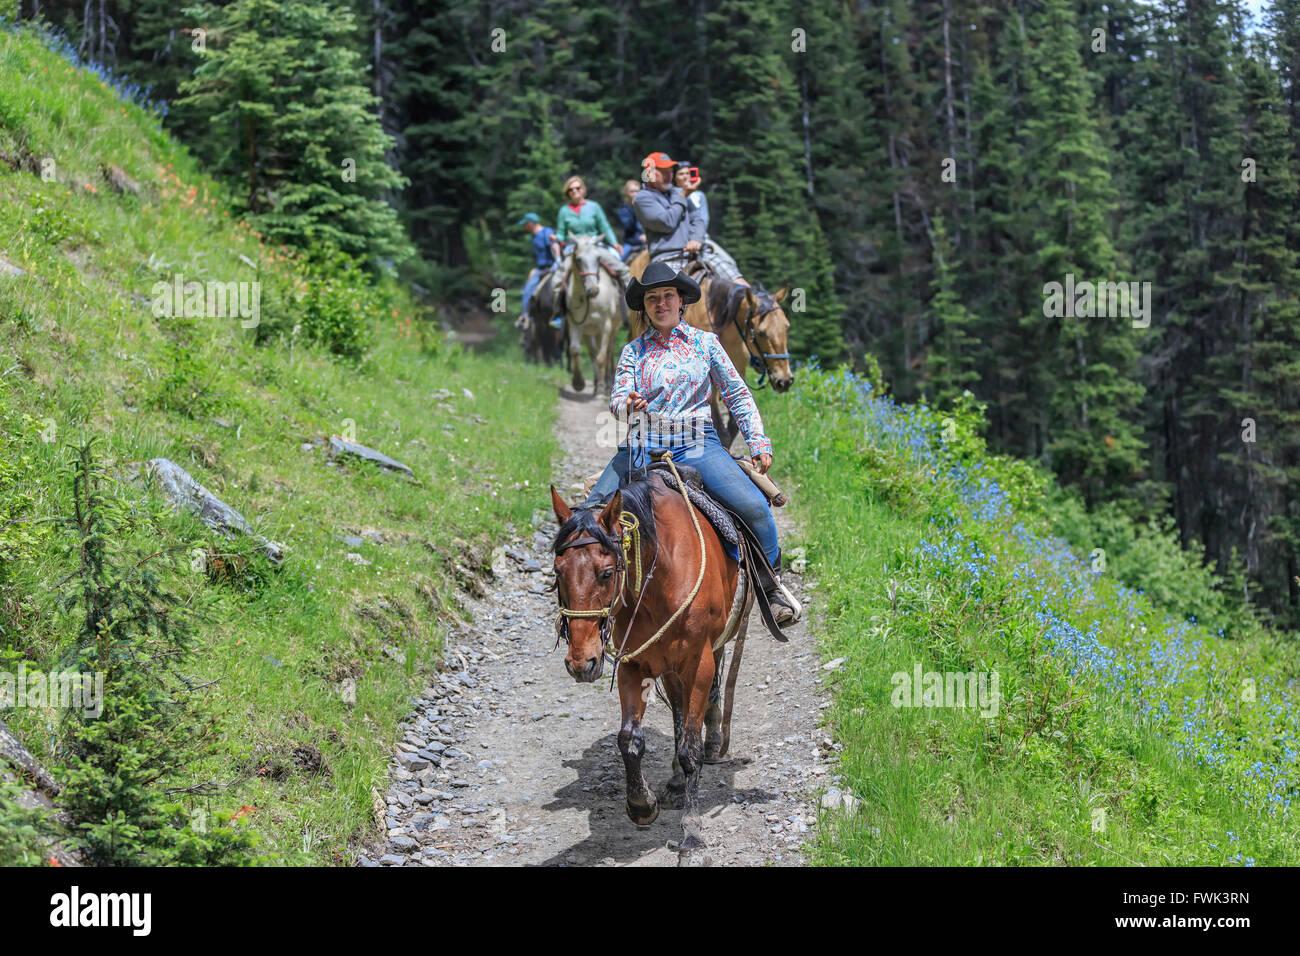 Horseback riders on a backcountry trail ride, Banff National Park, Alberta, Canada. - Stock Image